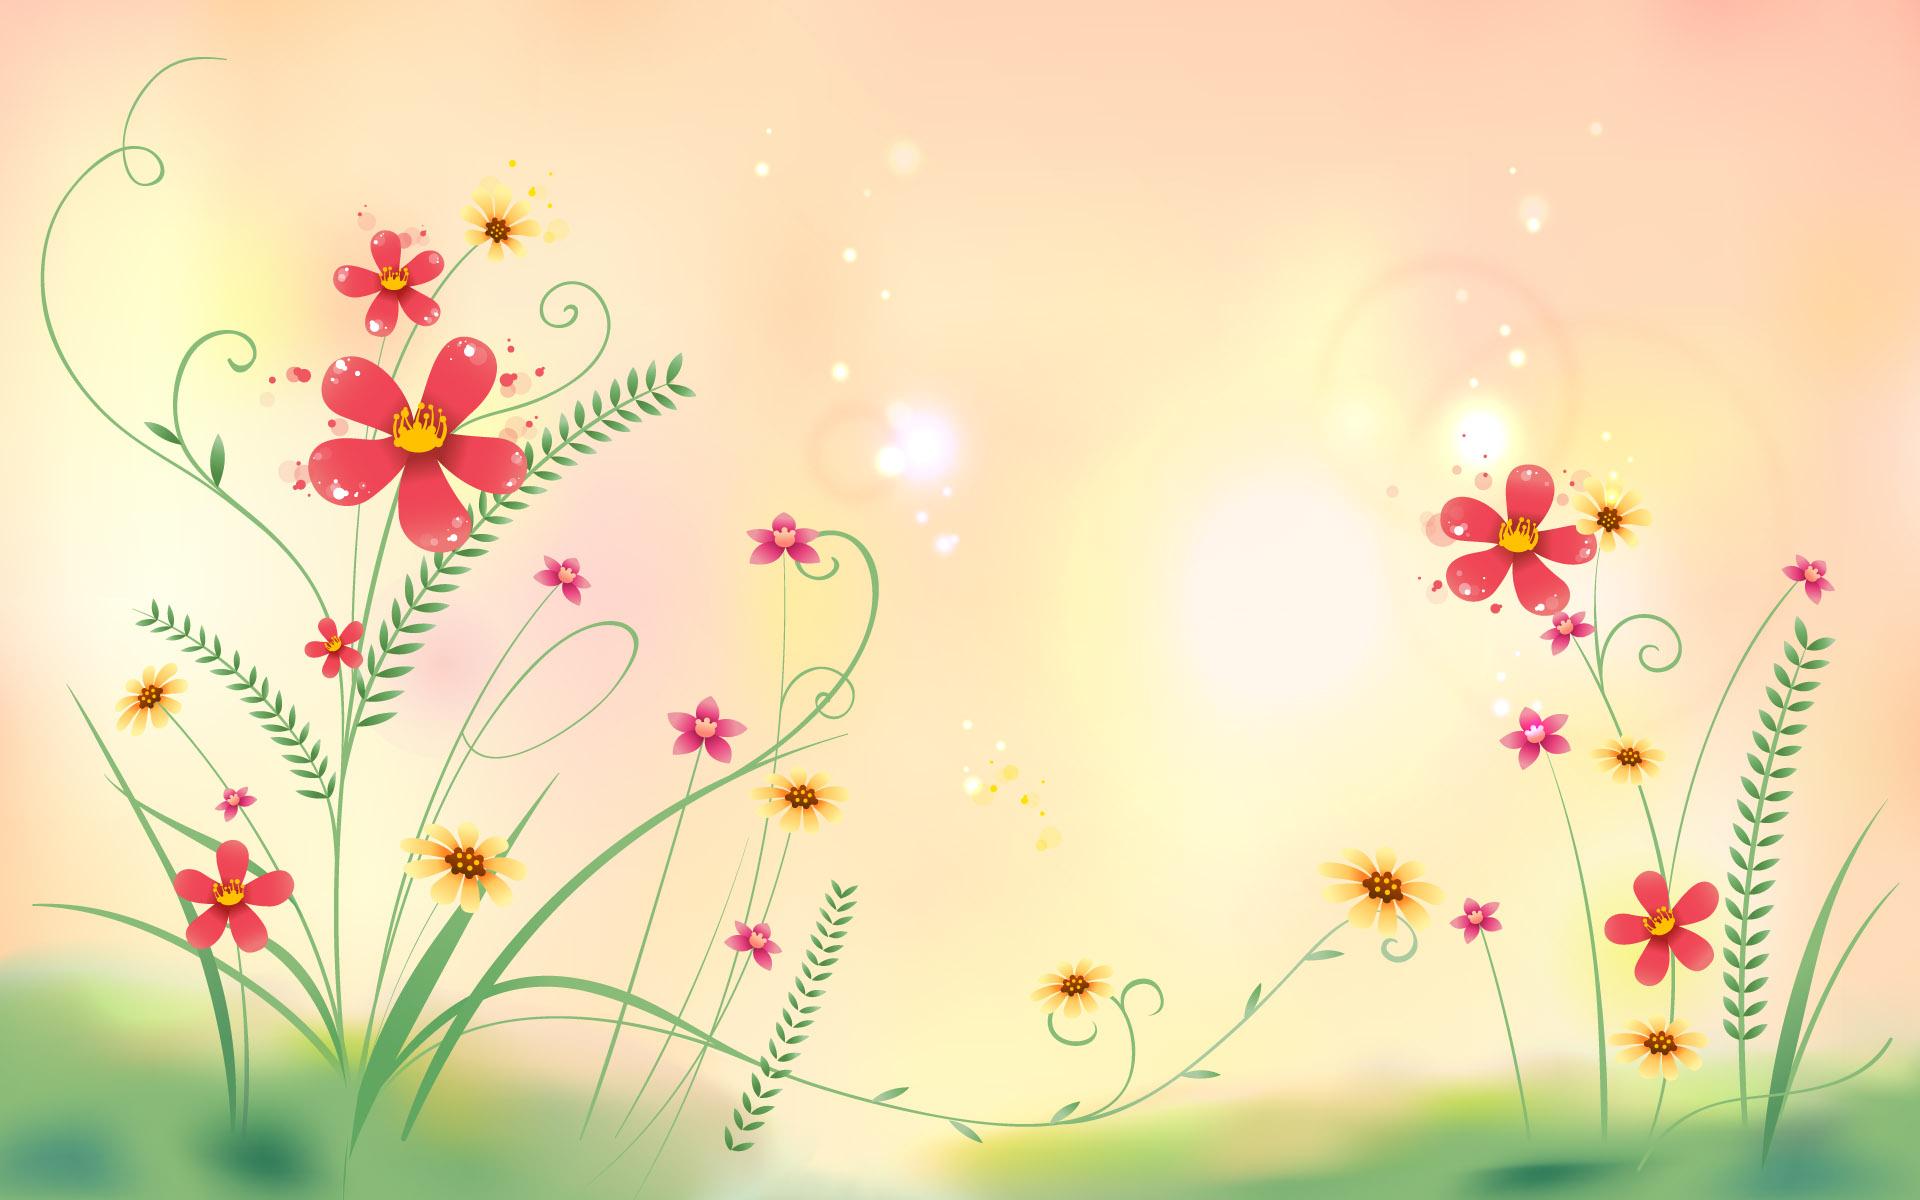 Floral Desktop Backgrounds Wallpaper 1920x1200